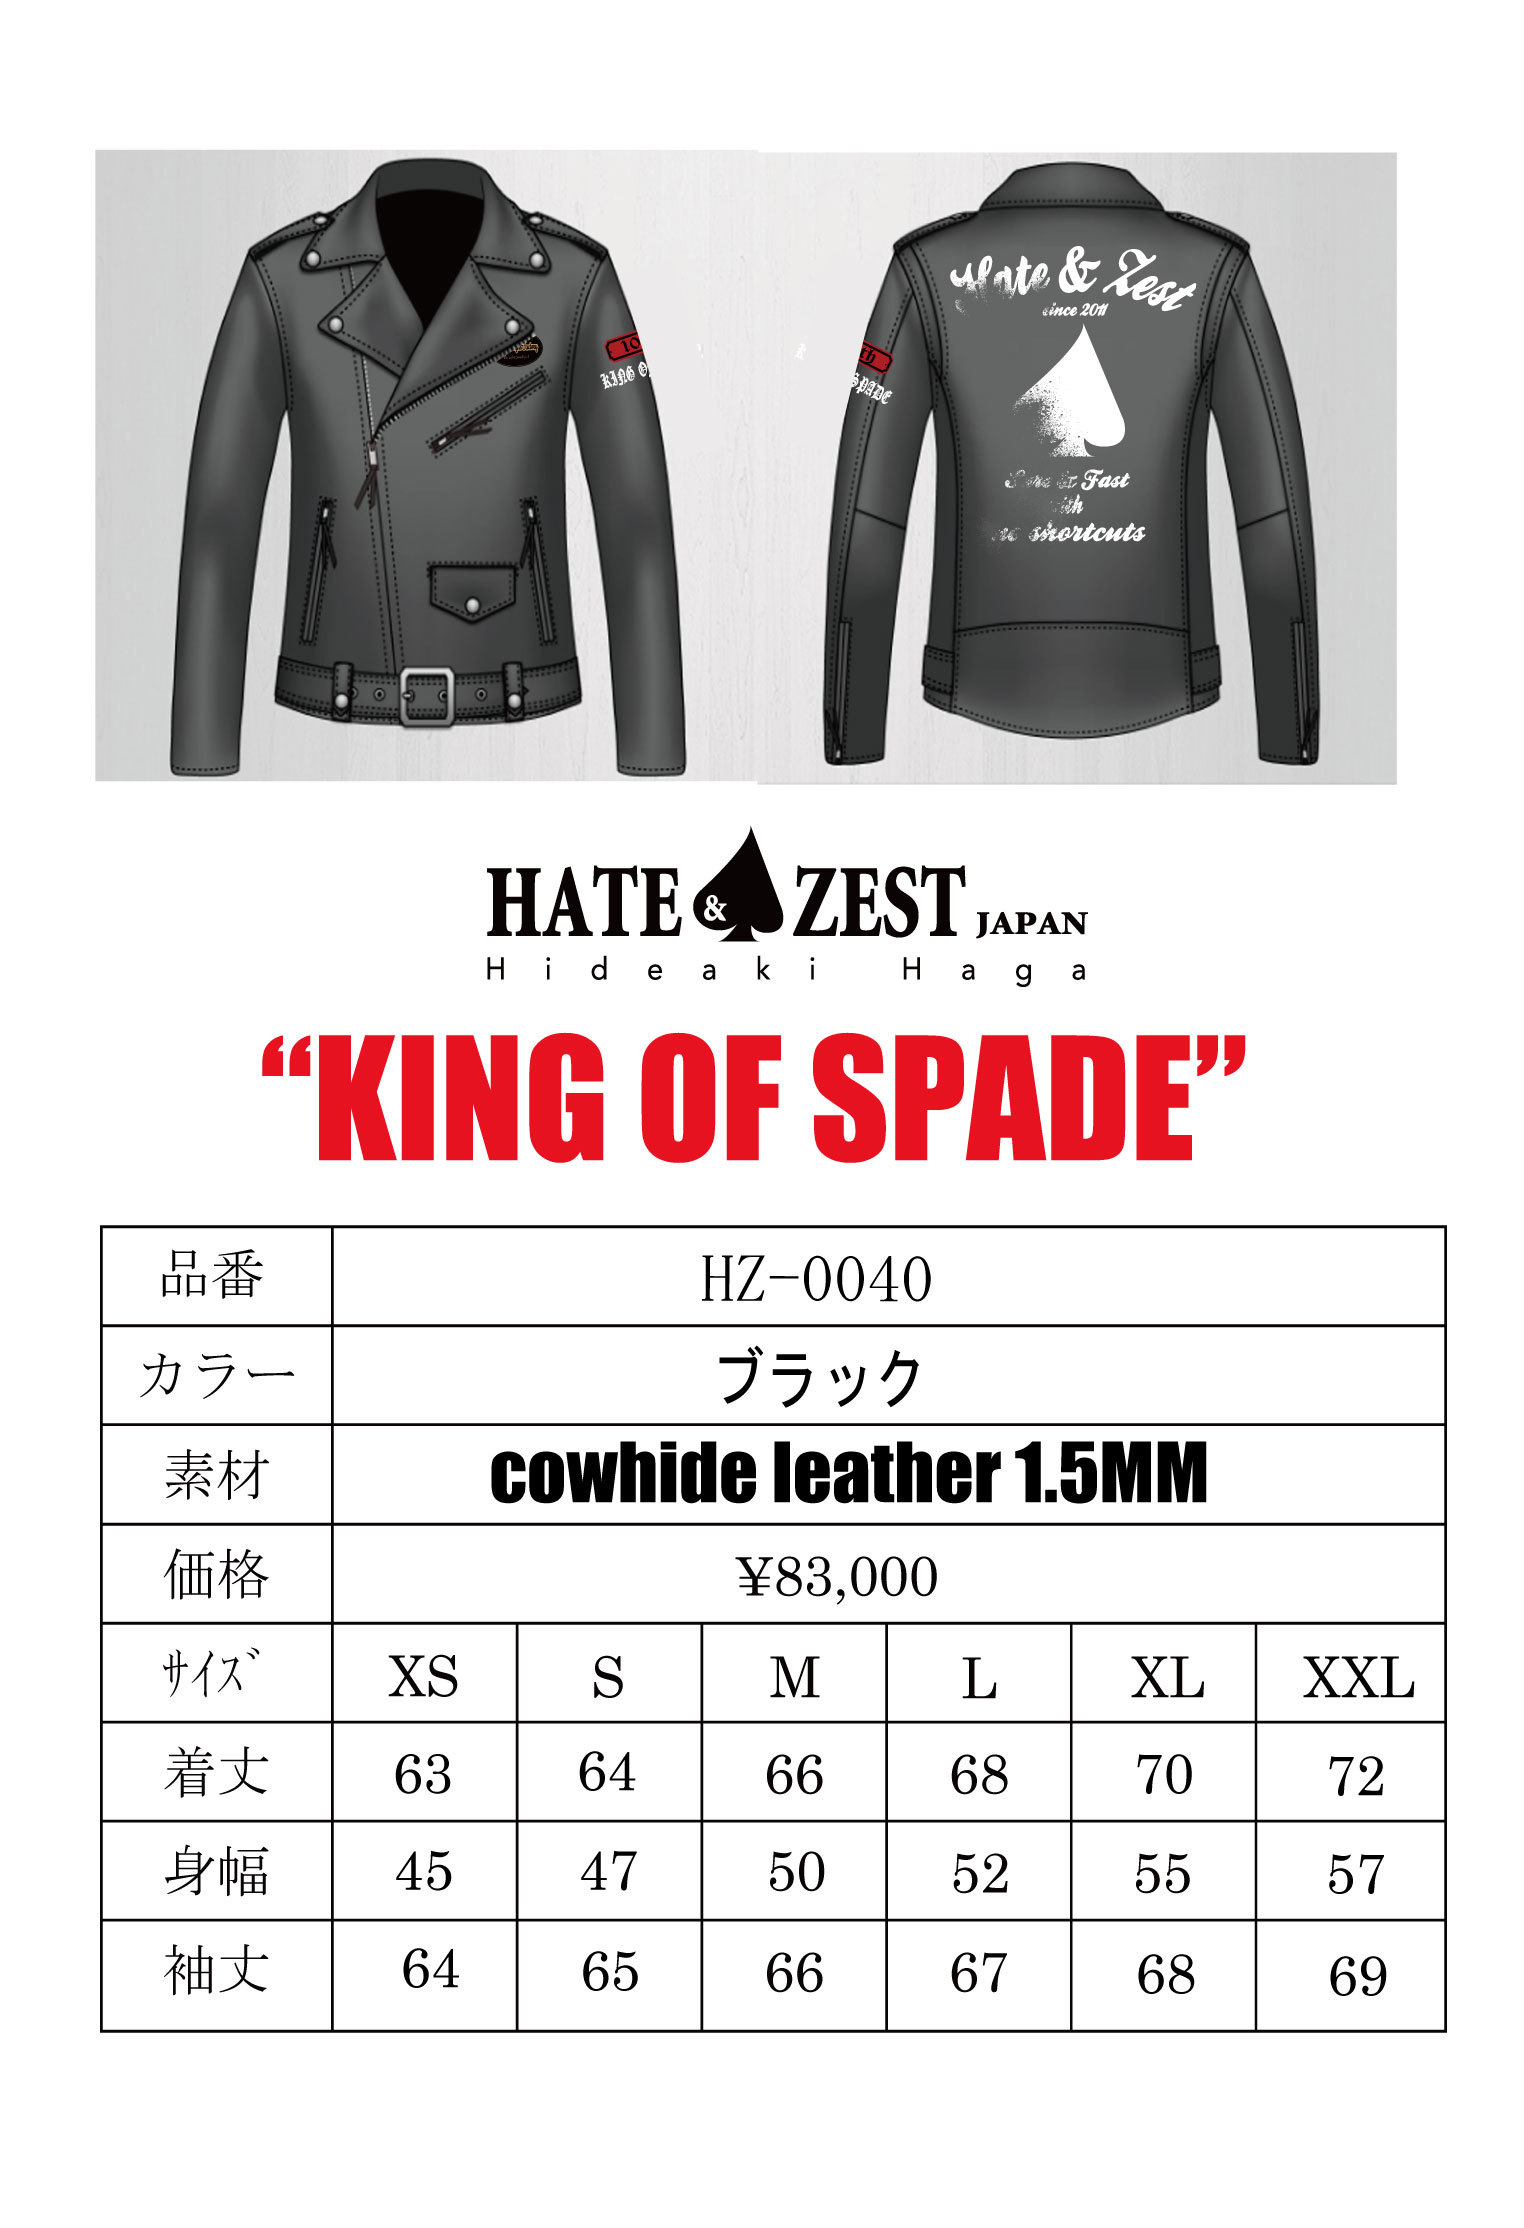 HATE&ZEST 10th Anniversary 第一弾 詳細_b0335651_18282392.jpg